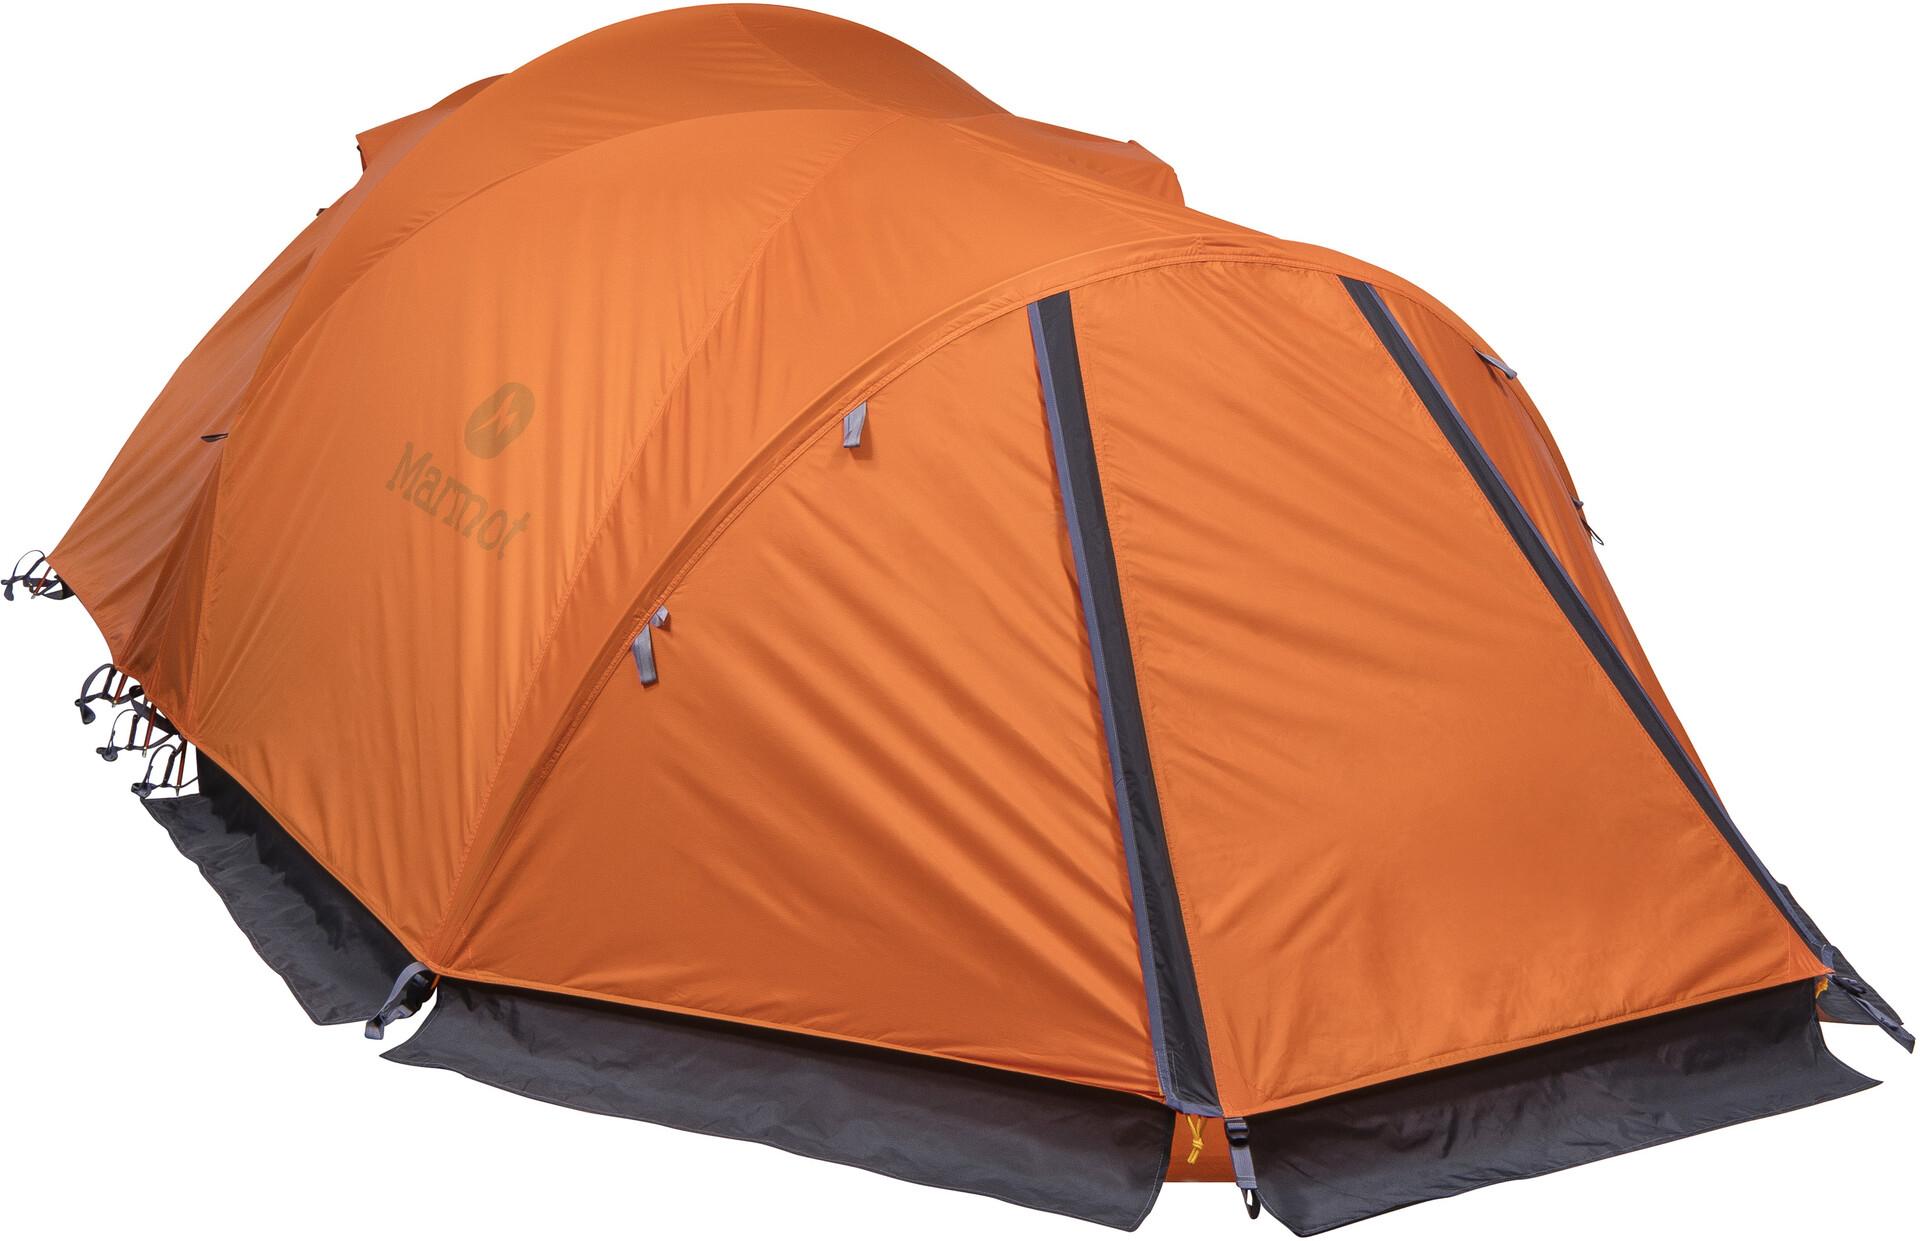 Hilleberg Saitaris Tent, red l Online outdoor shop Campz.nl